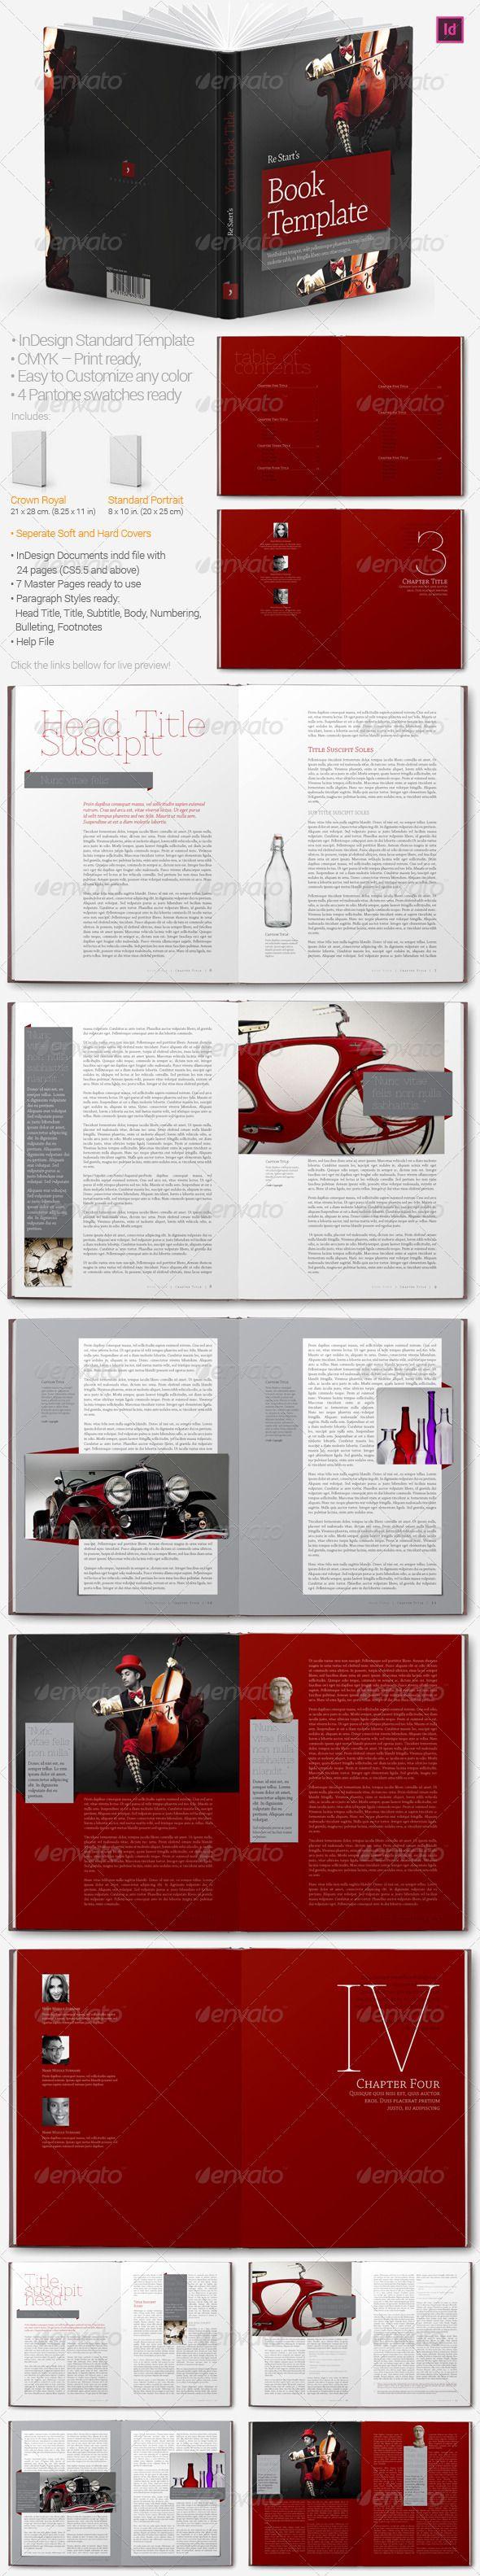 Color book in design - Book Templates